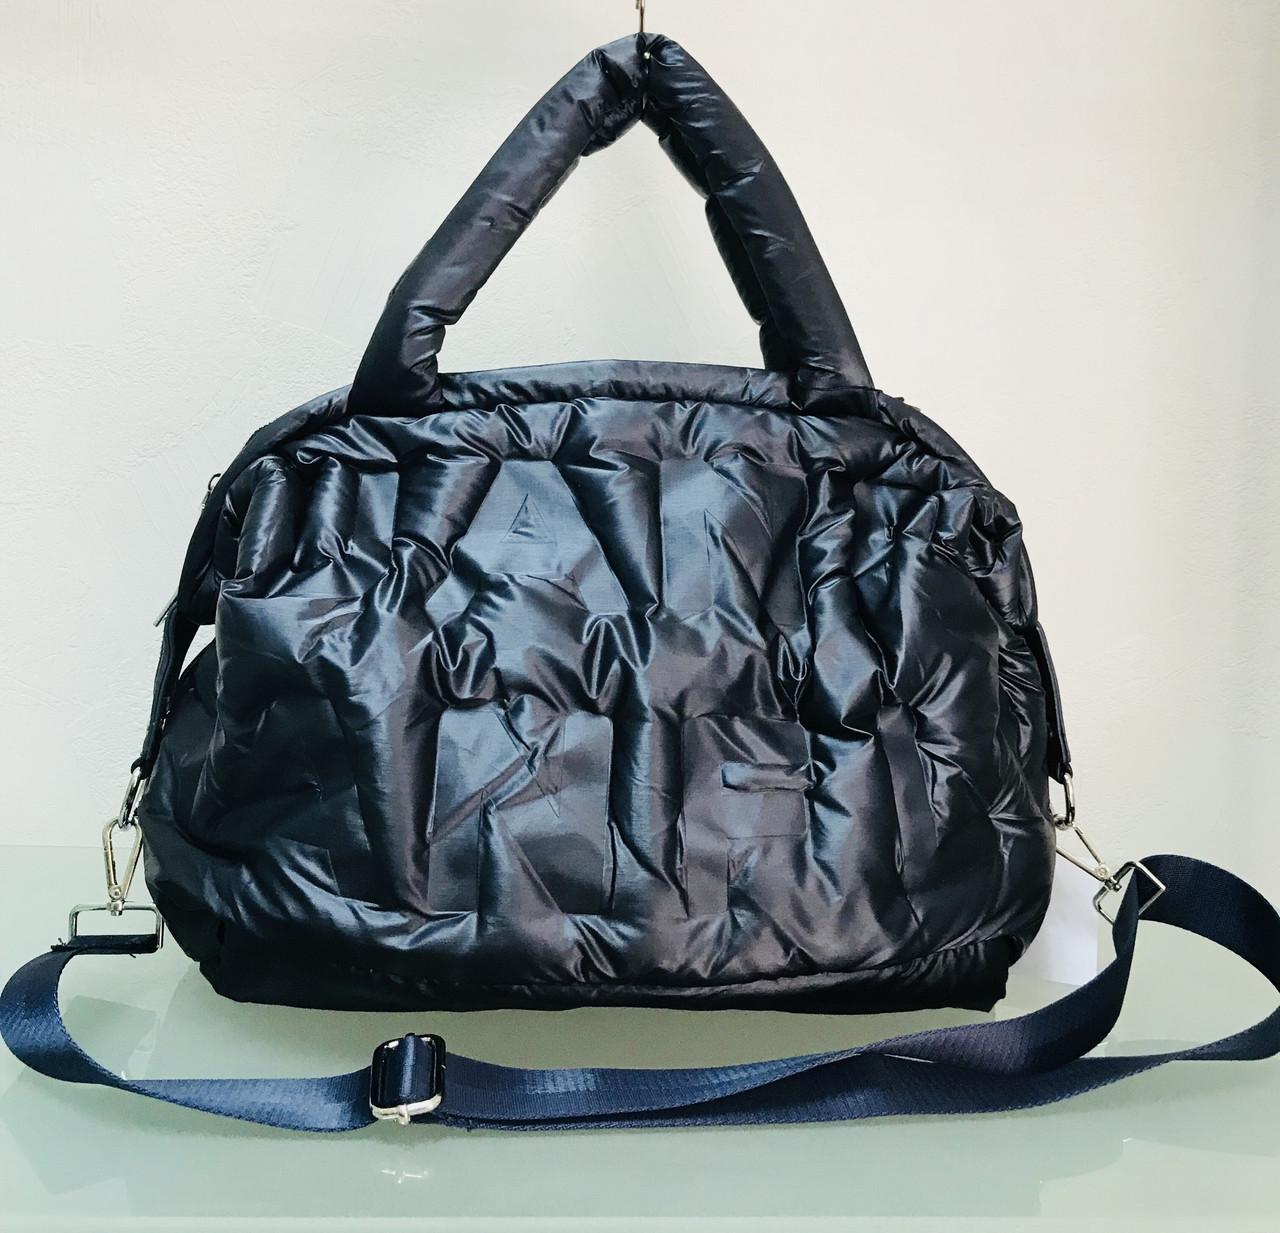 82eb99497 Сумка бренд LUX копия синяя стеганая текстиль - Интернет-магазин